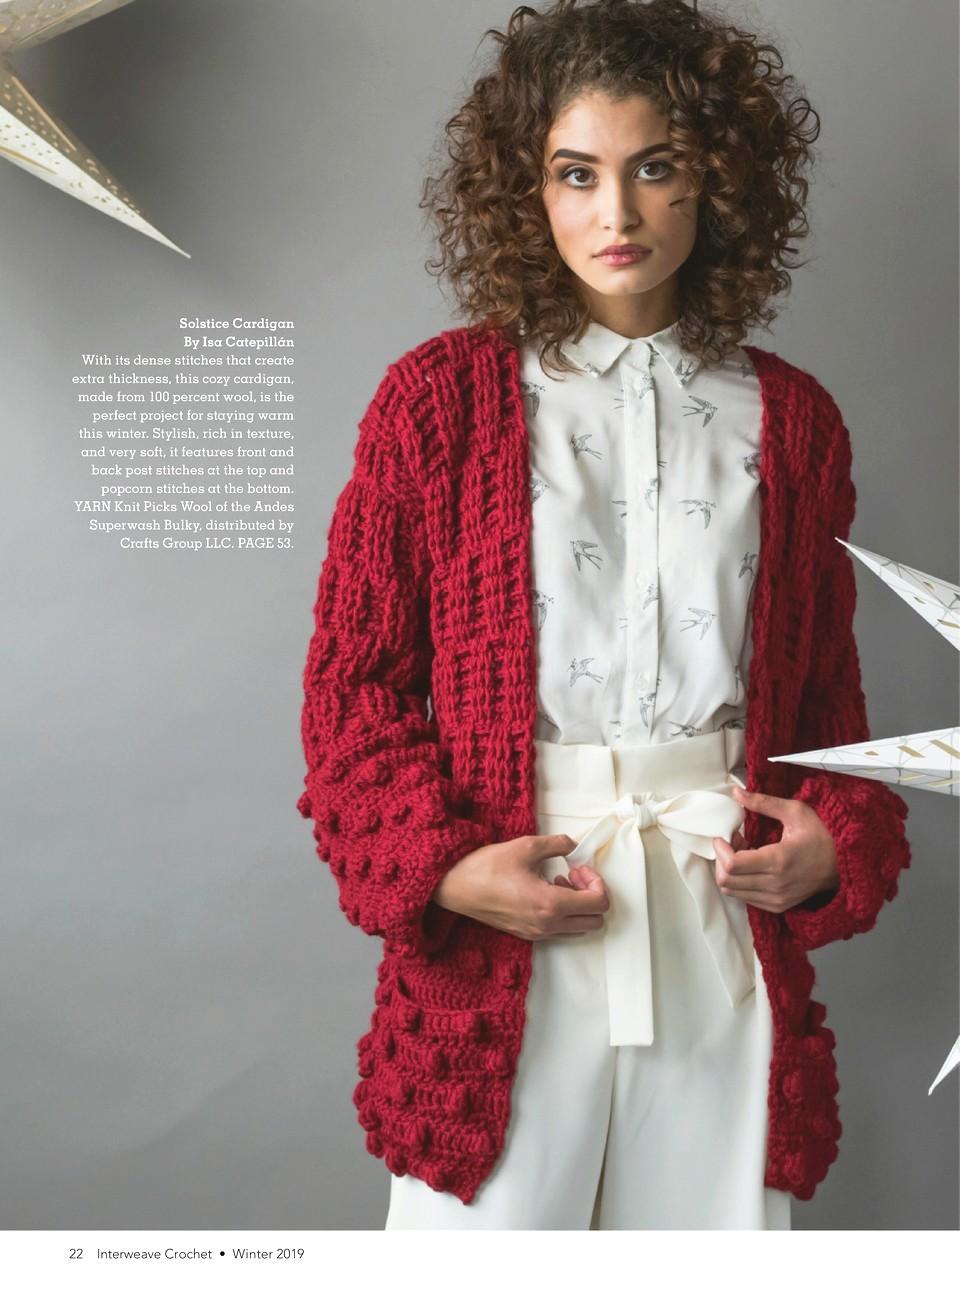 Interweave Crochet Winter 2019-23